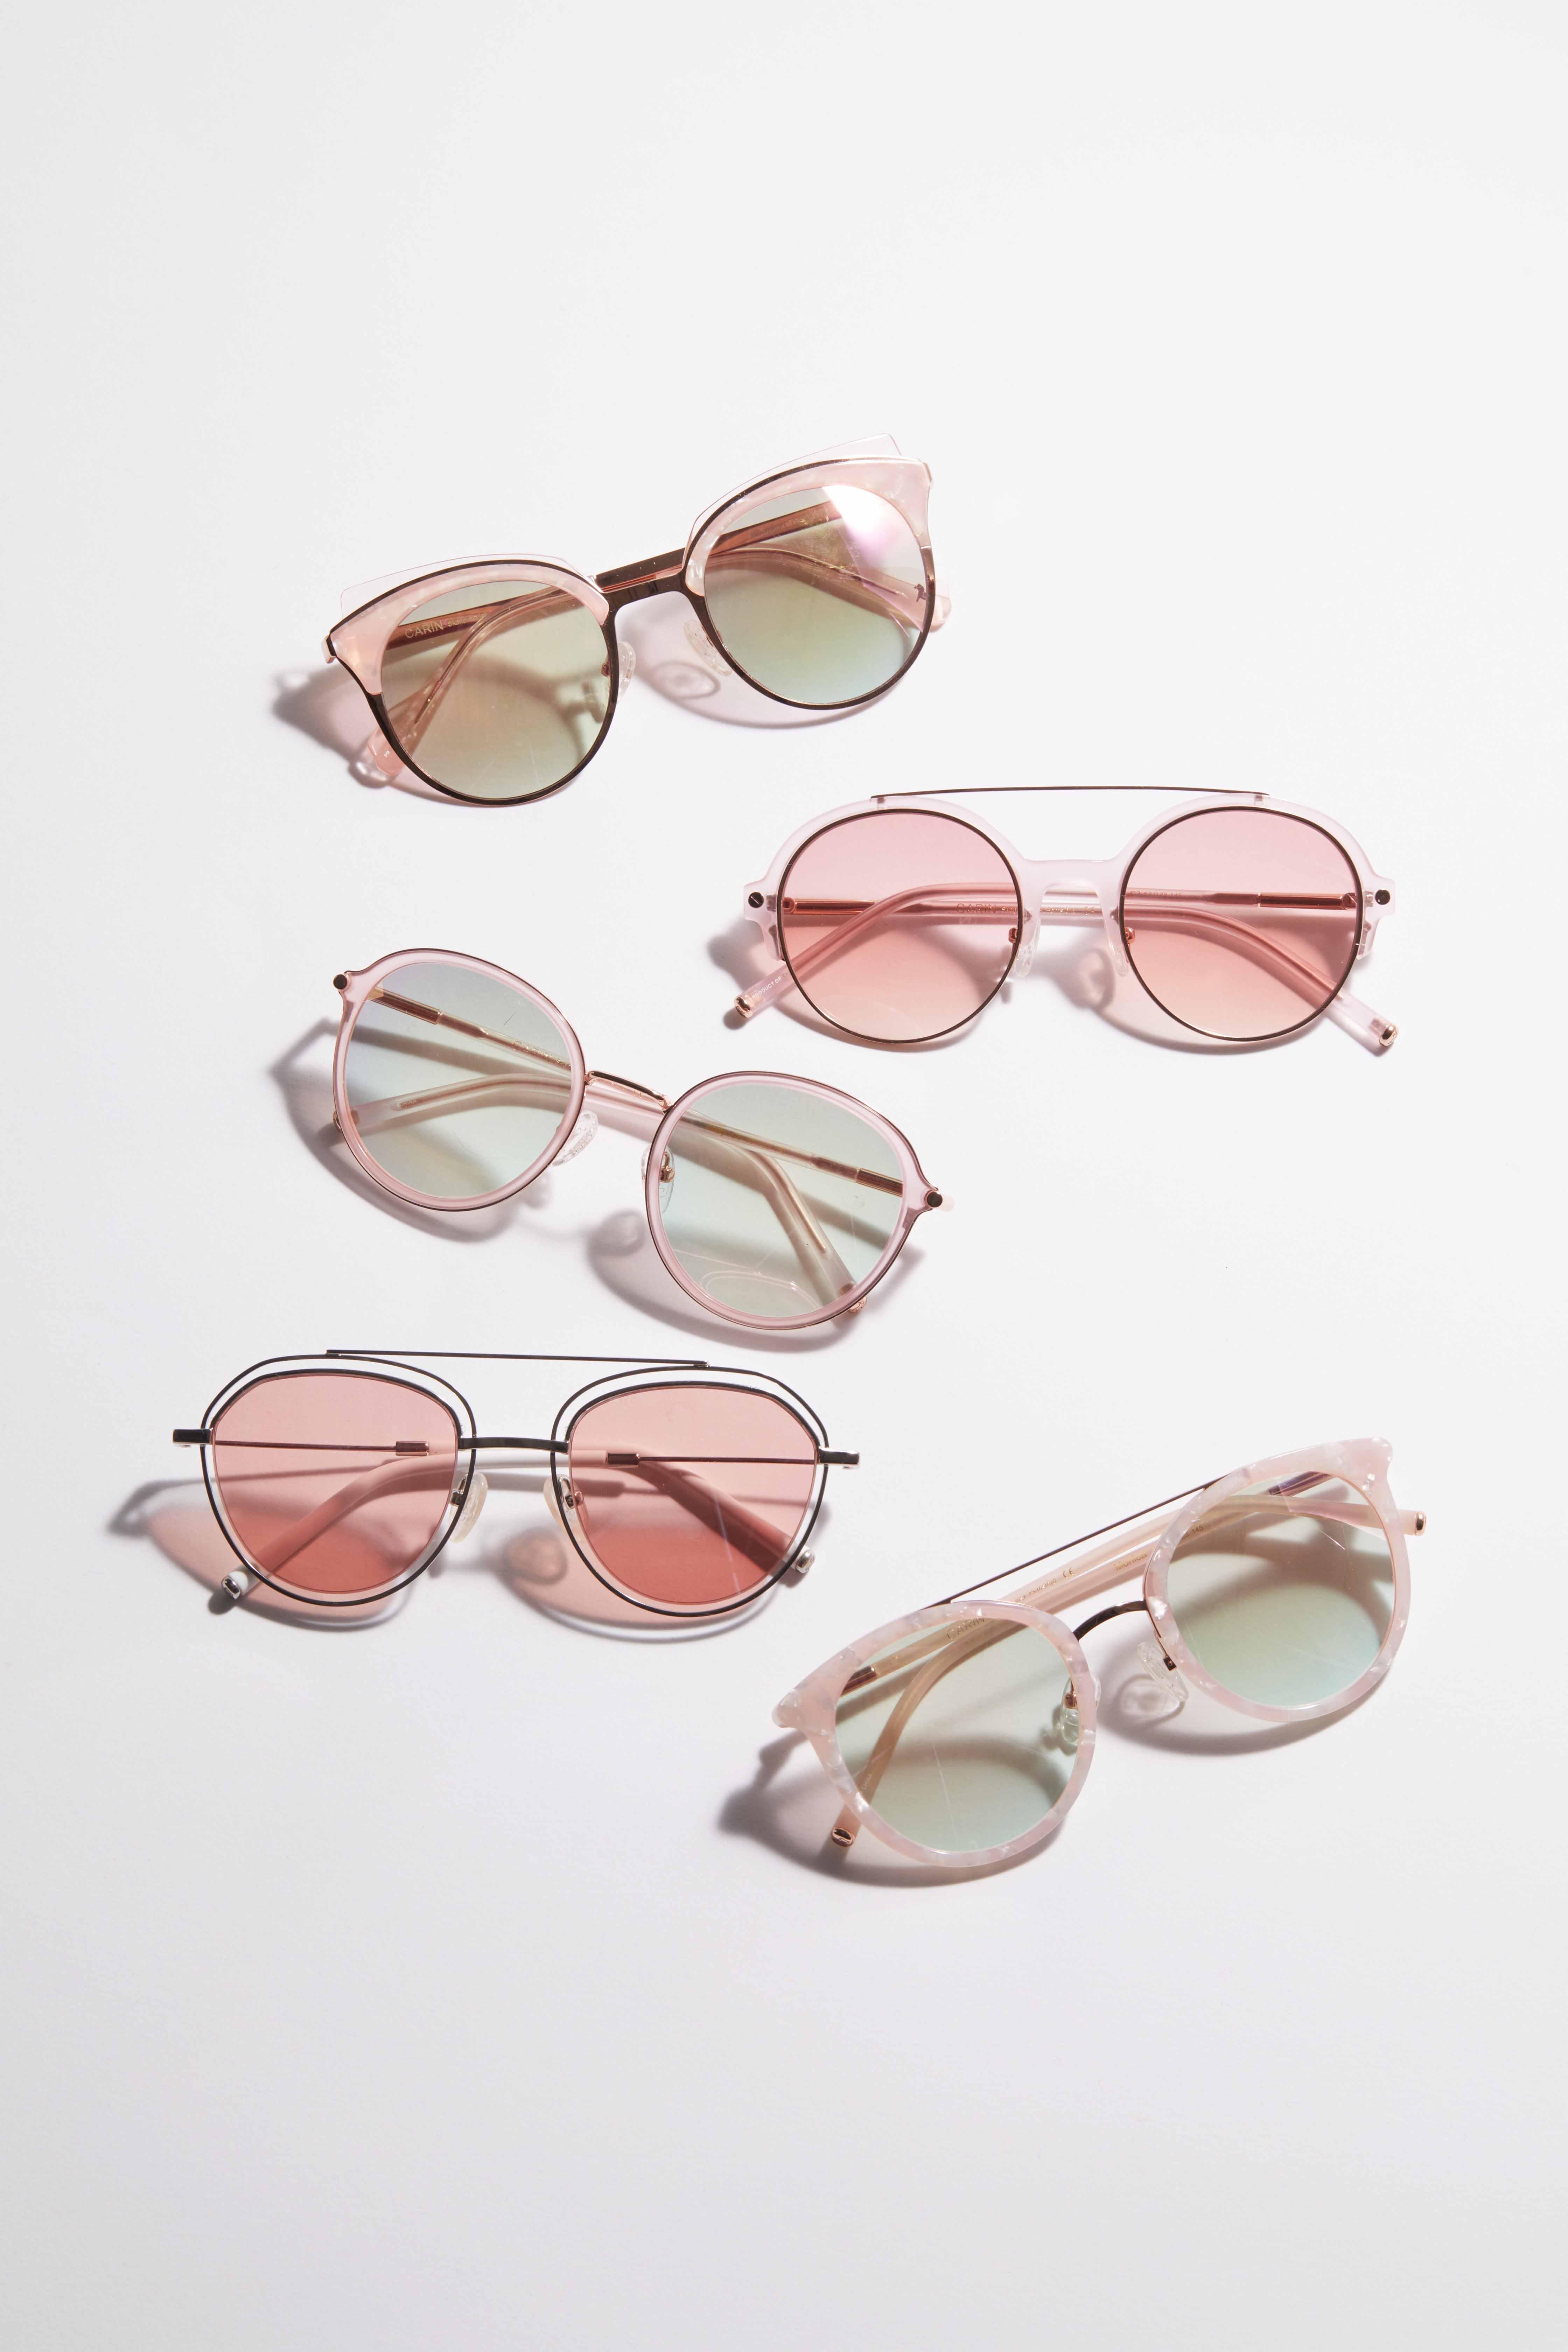 da68959a6eae Carin Eyewear - Sunglasses - Bright Vision Optometry